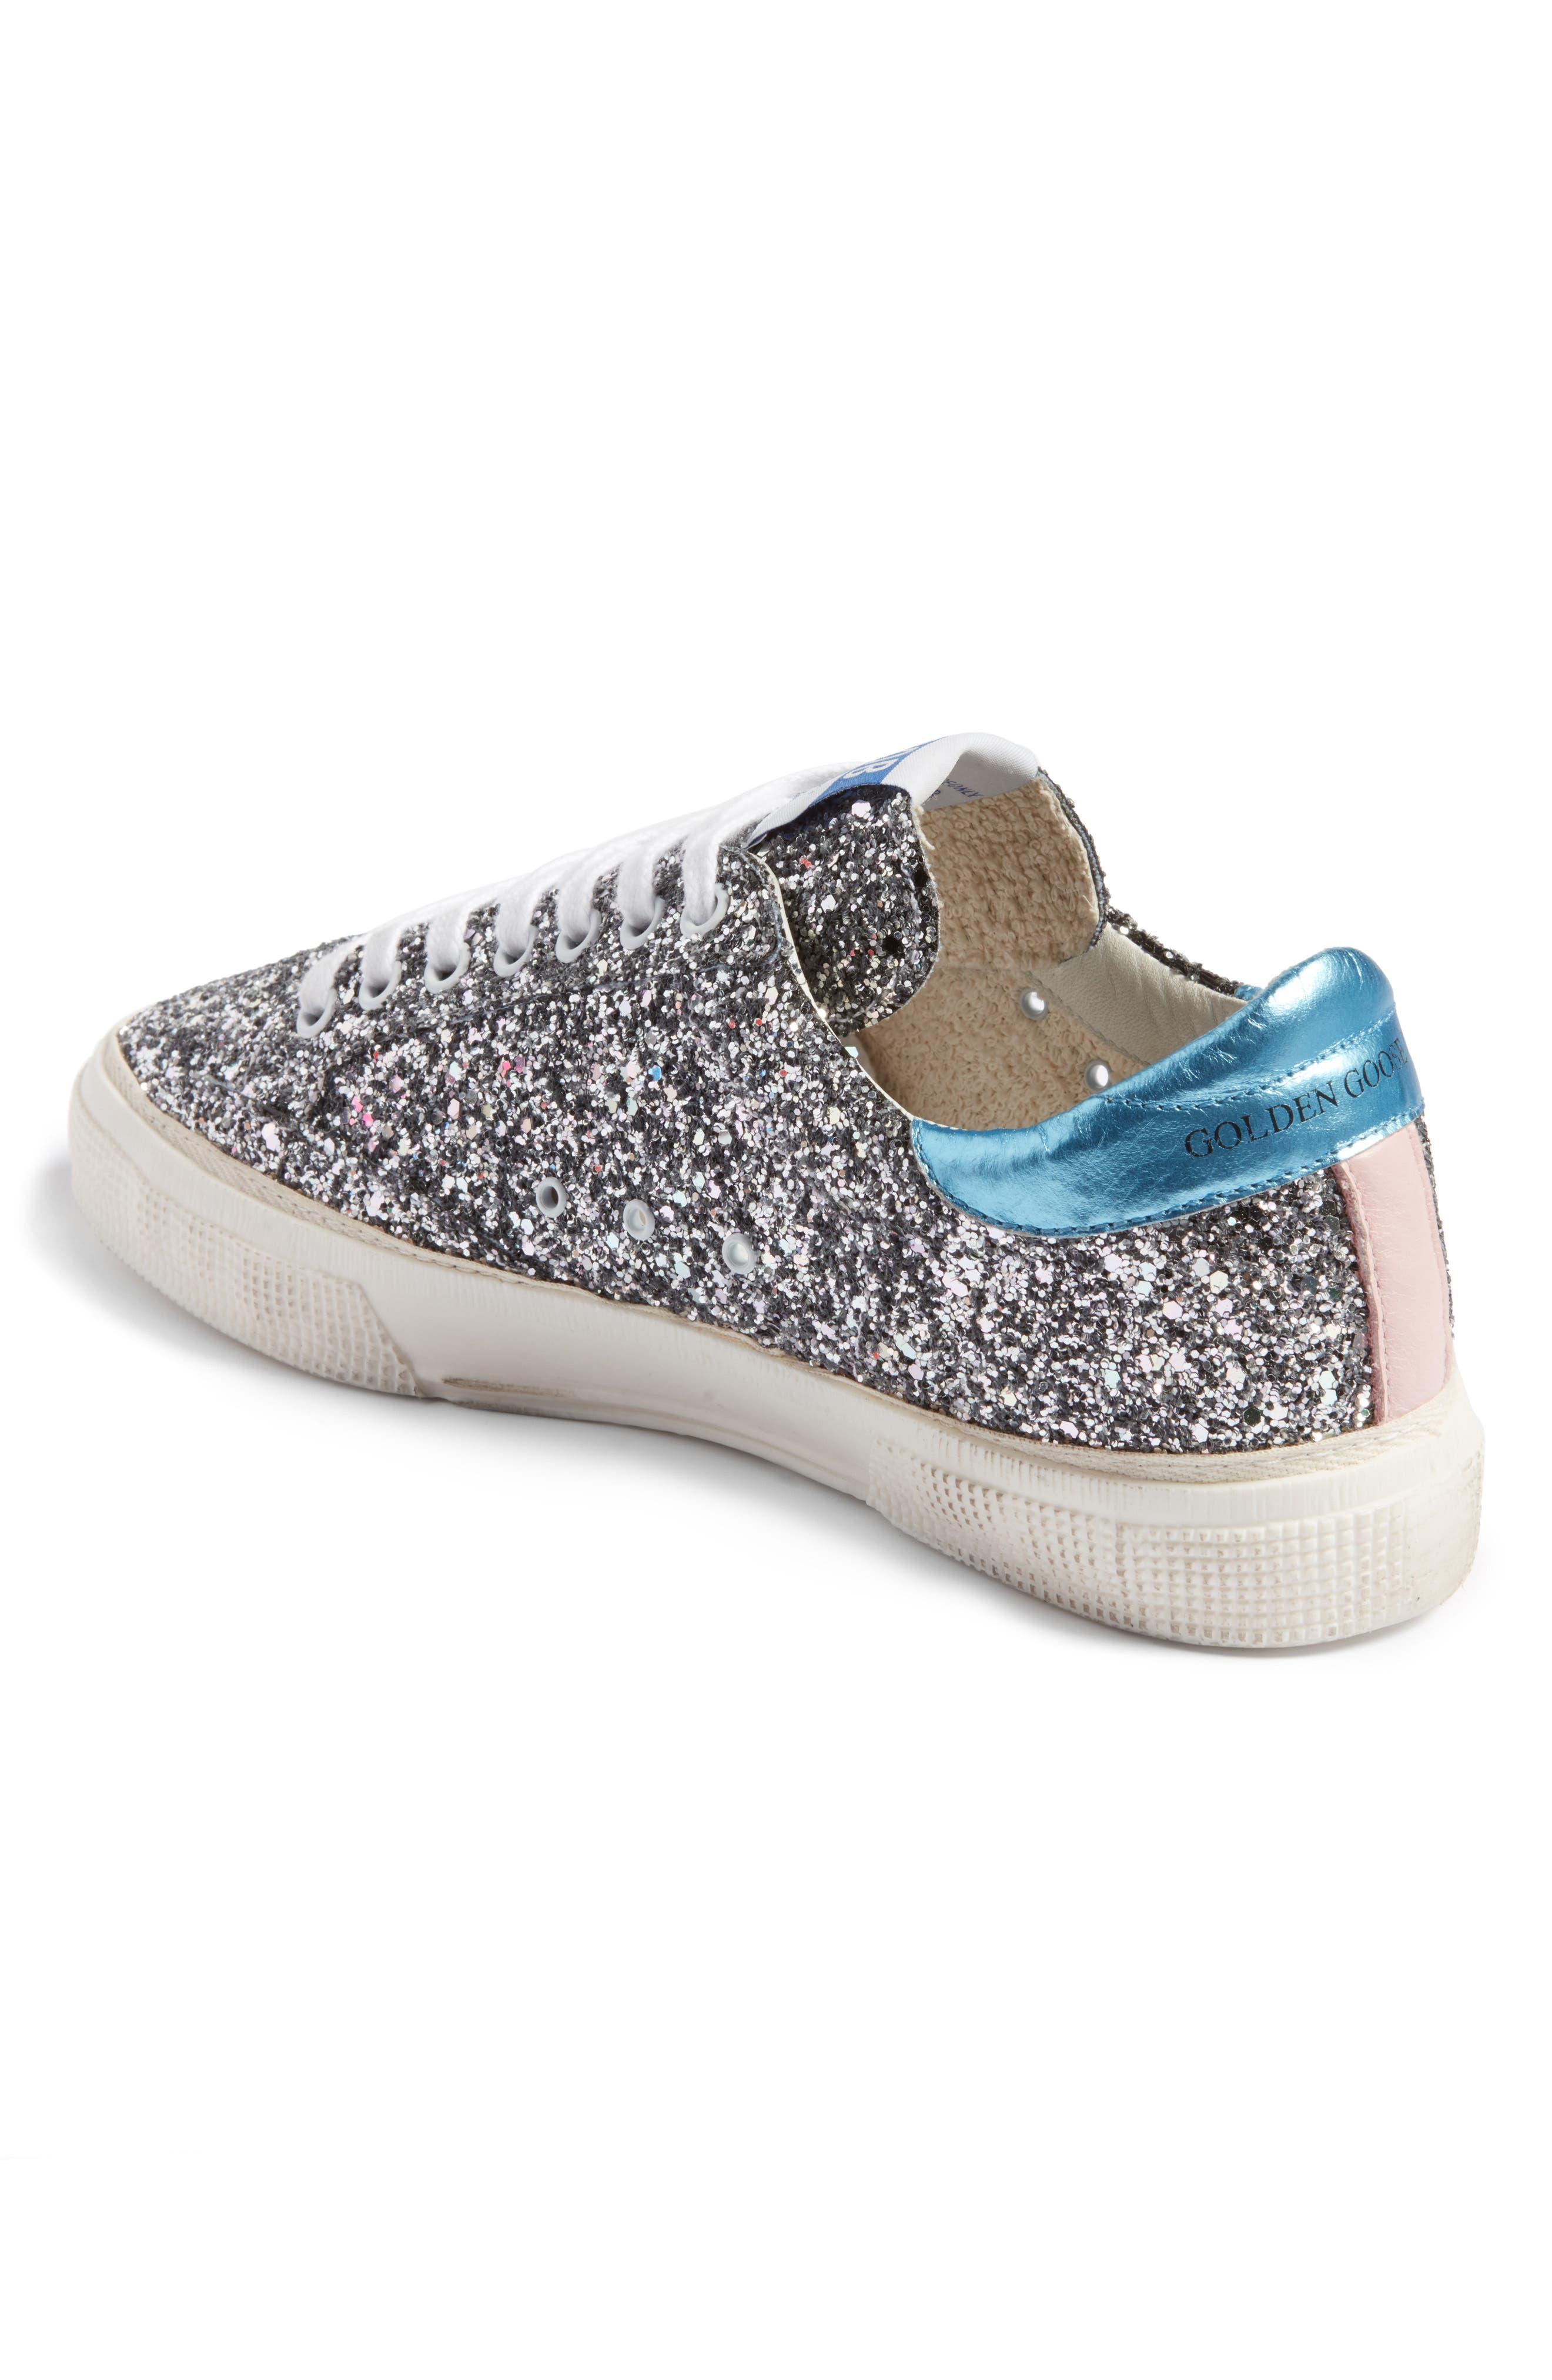 May Sneaker,                             Alternate thumbnail 2, color,                             040